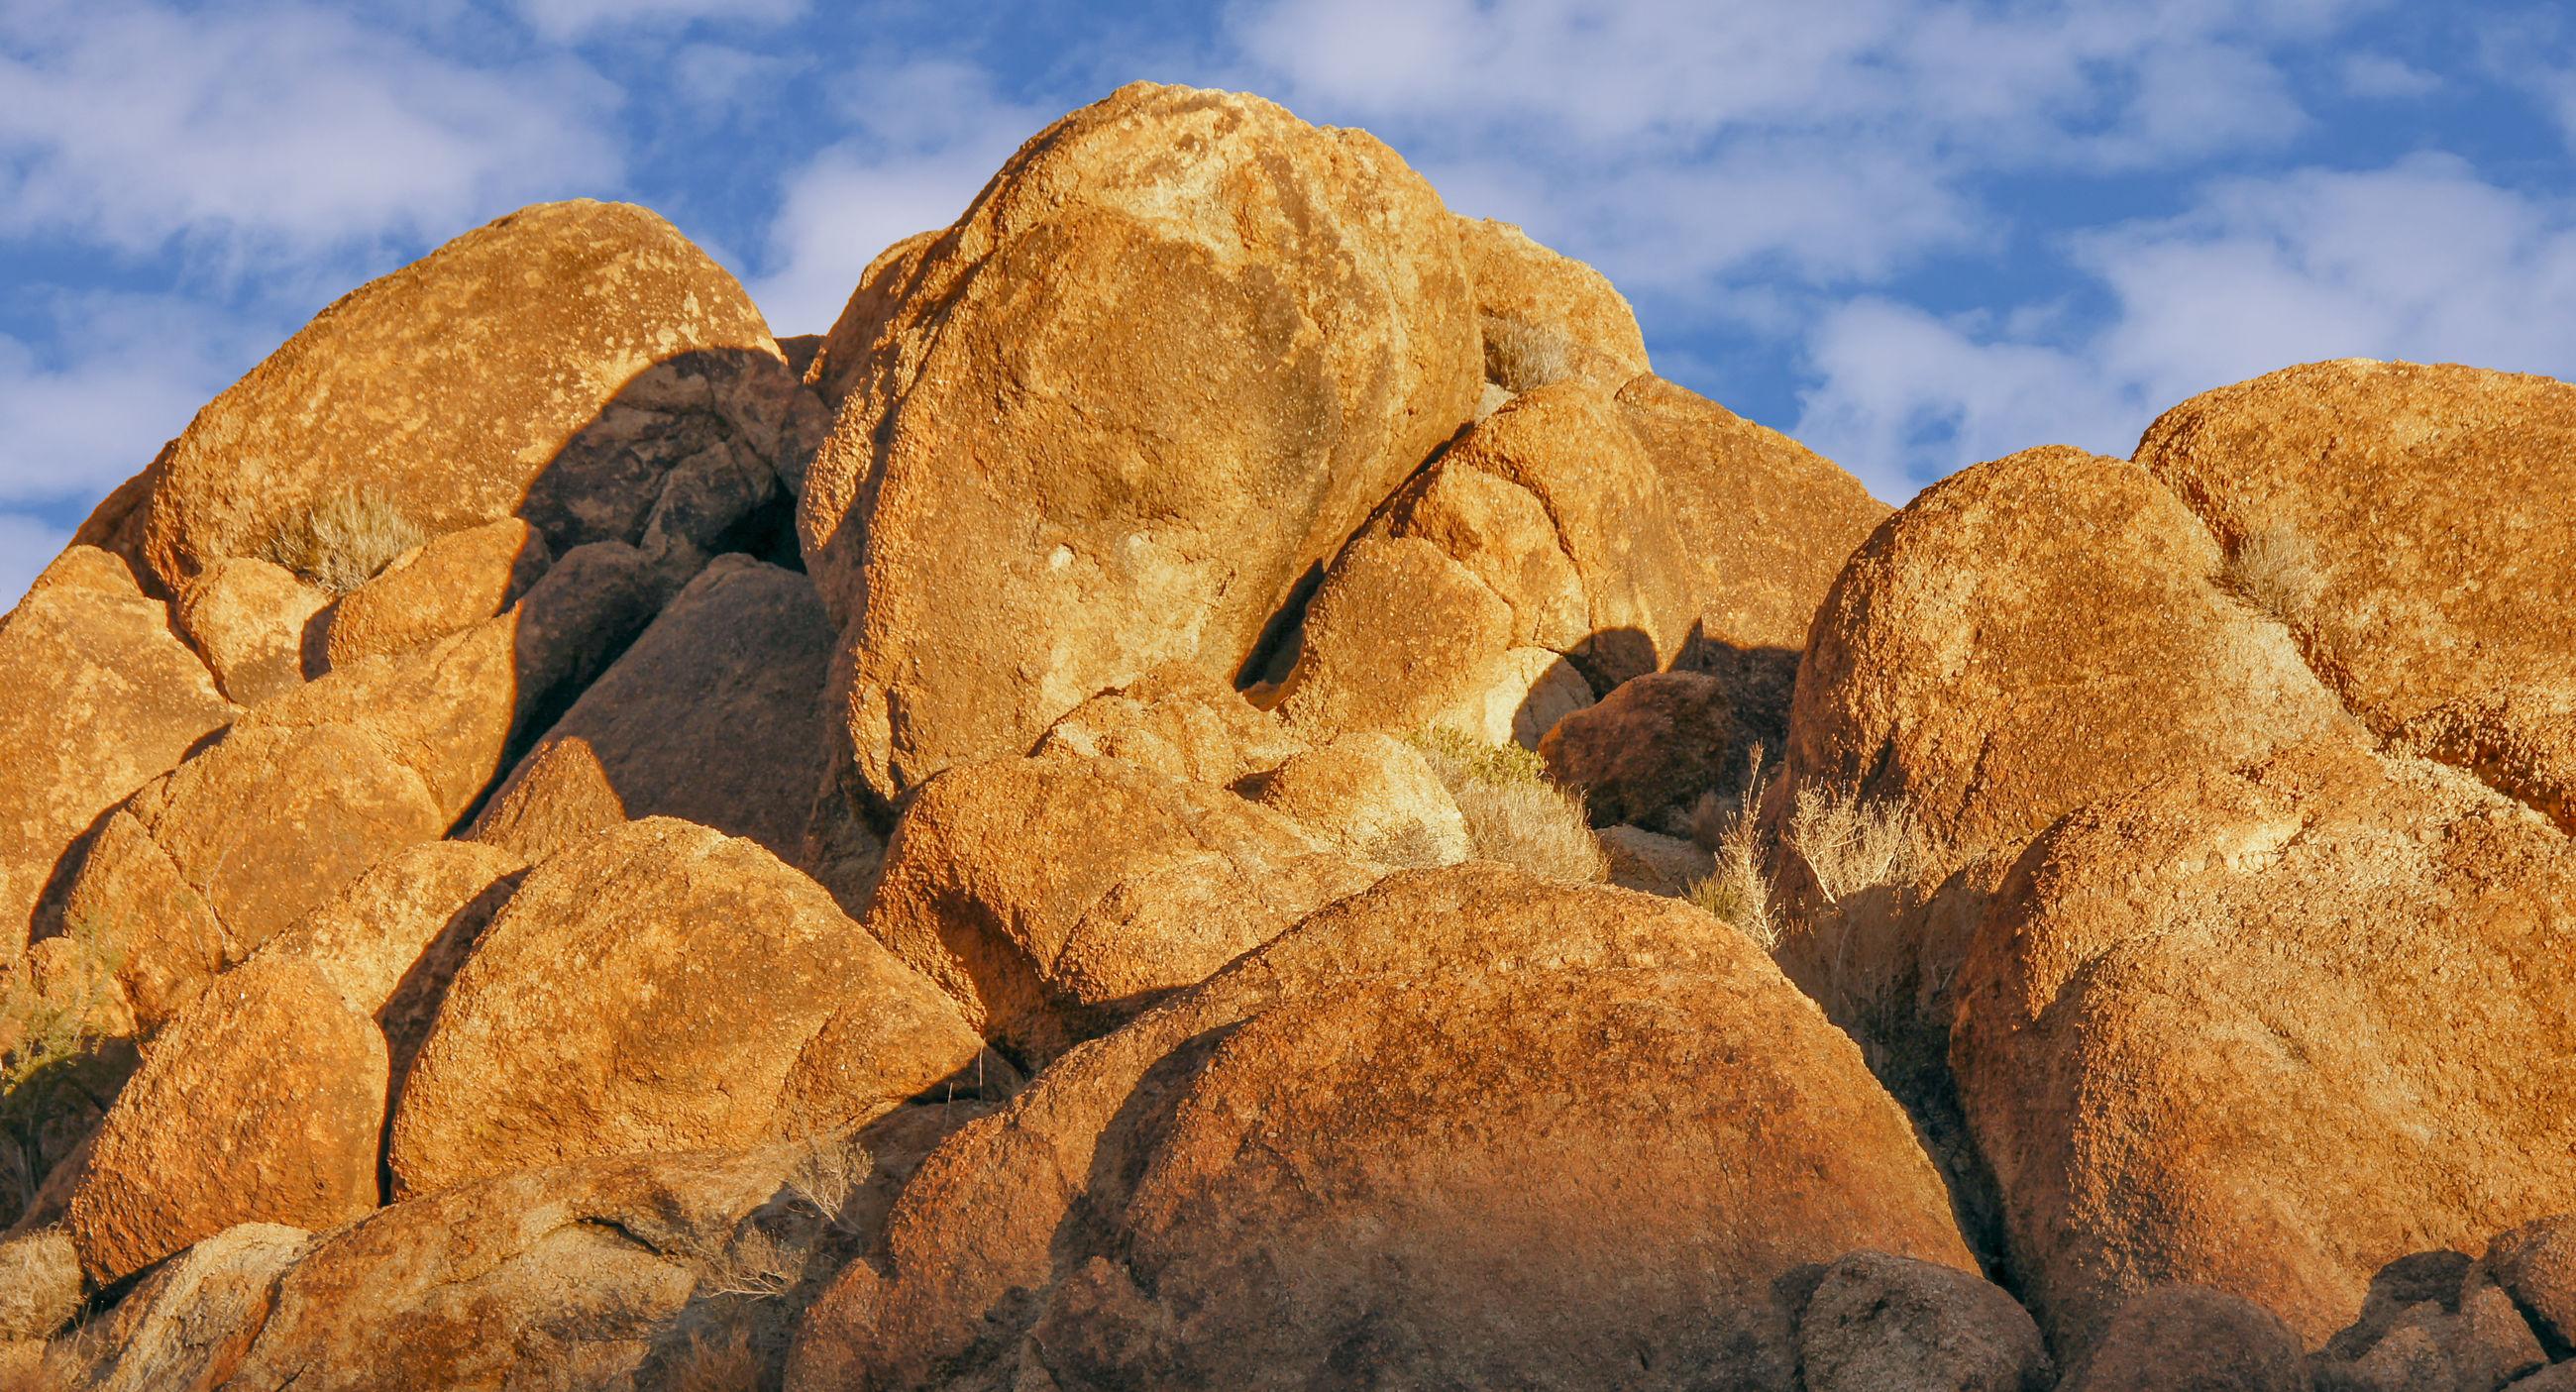 Jumbo rocks in late afternoon sunlight. joshua tree national park, california, usa.